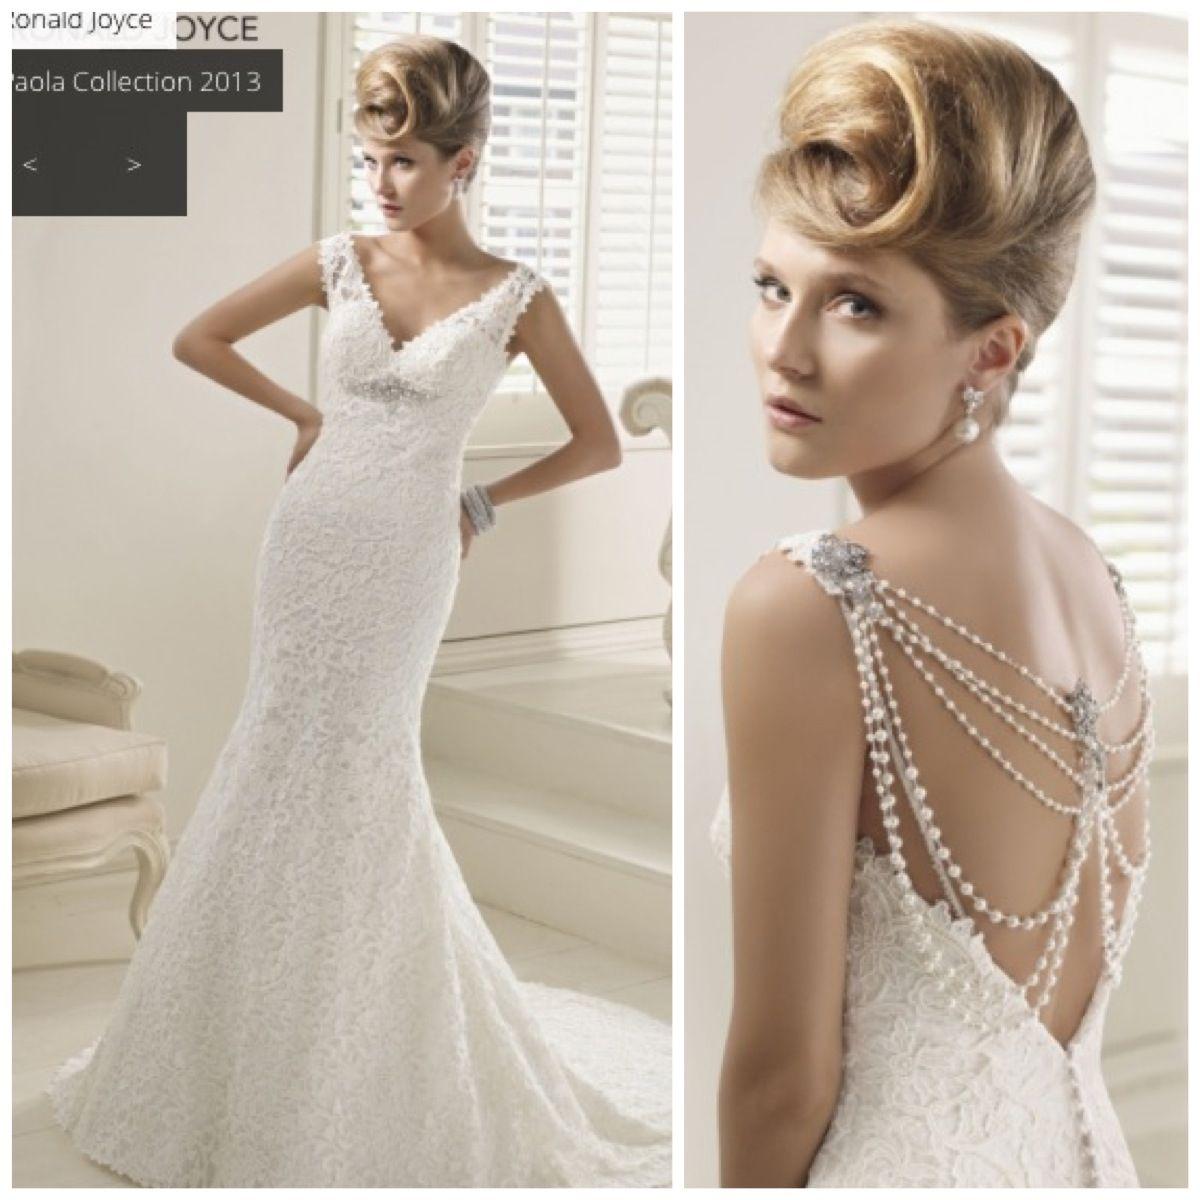 Vintage Style Wedding Dress Ronald Joyce 2013 Collection